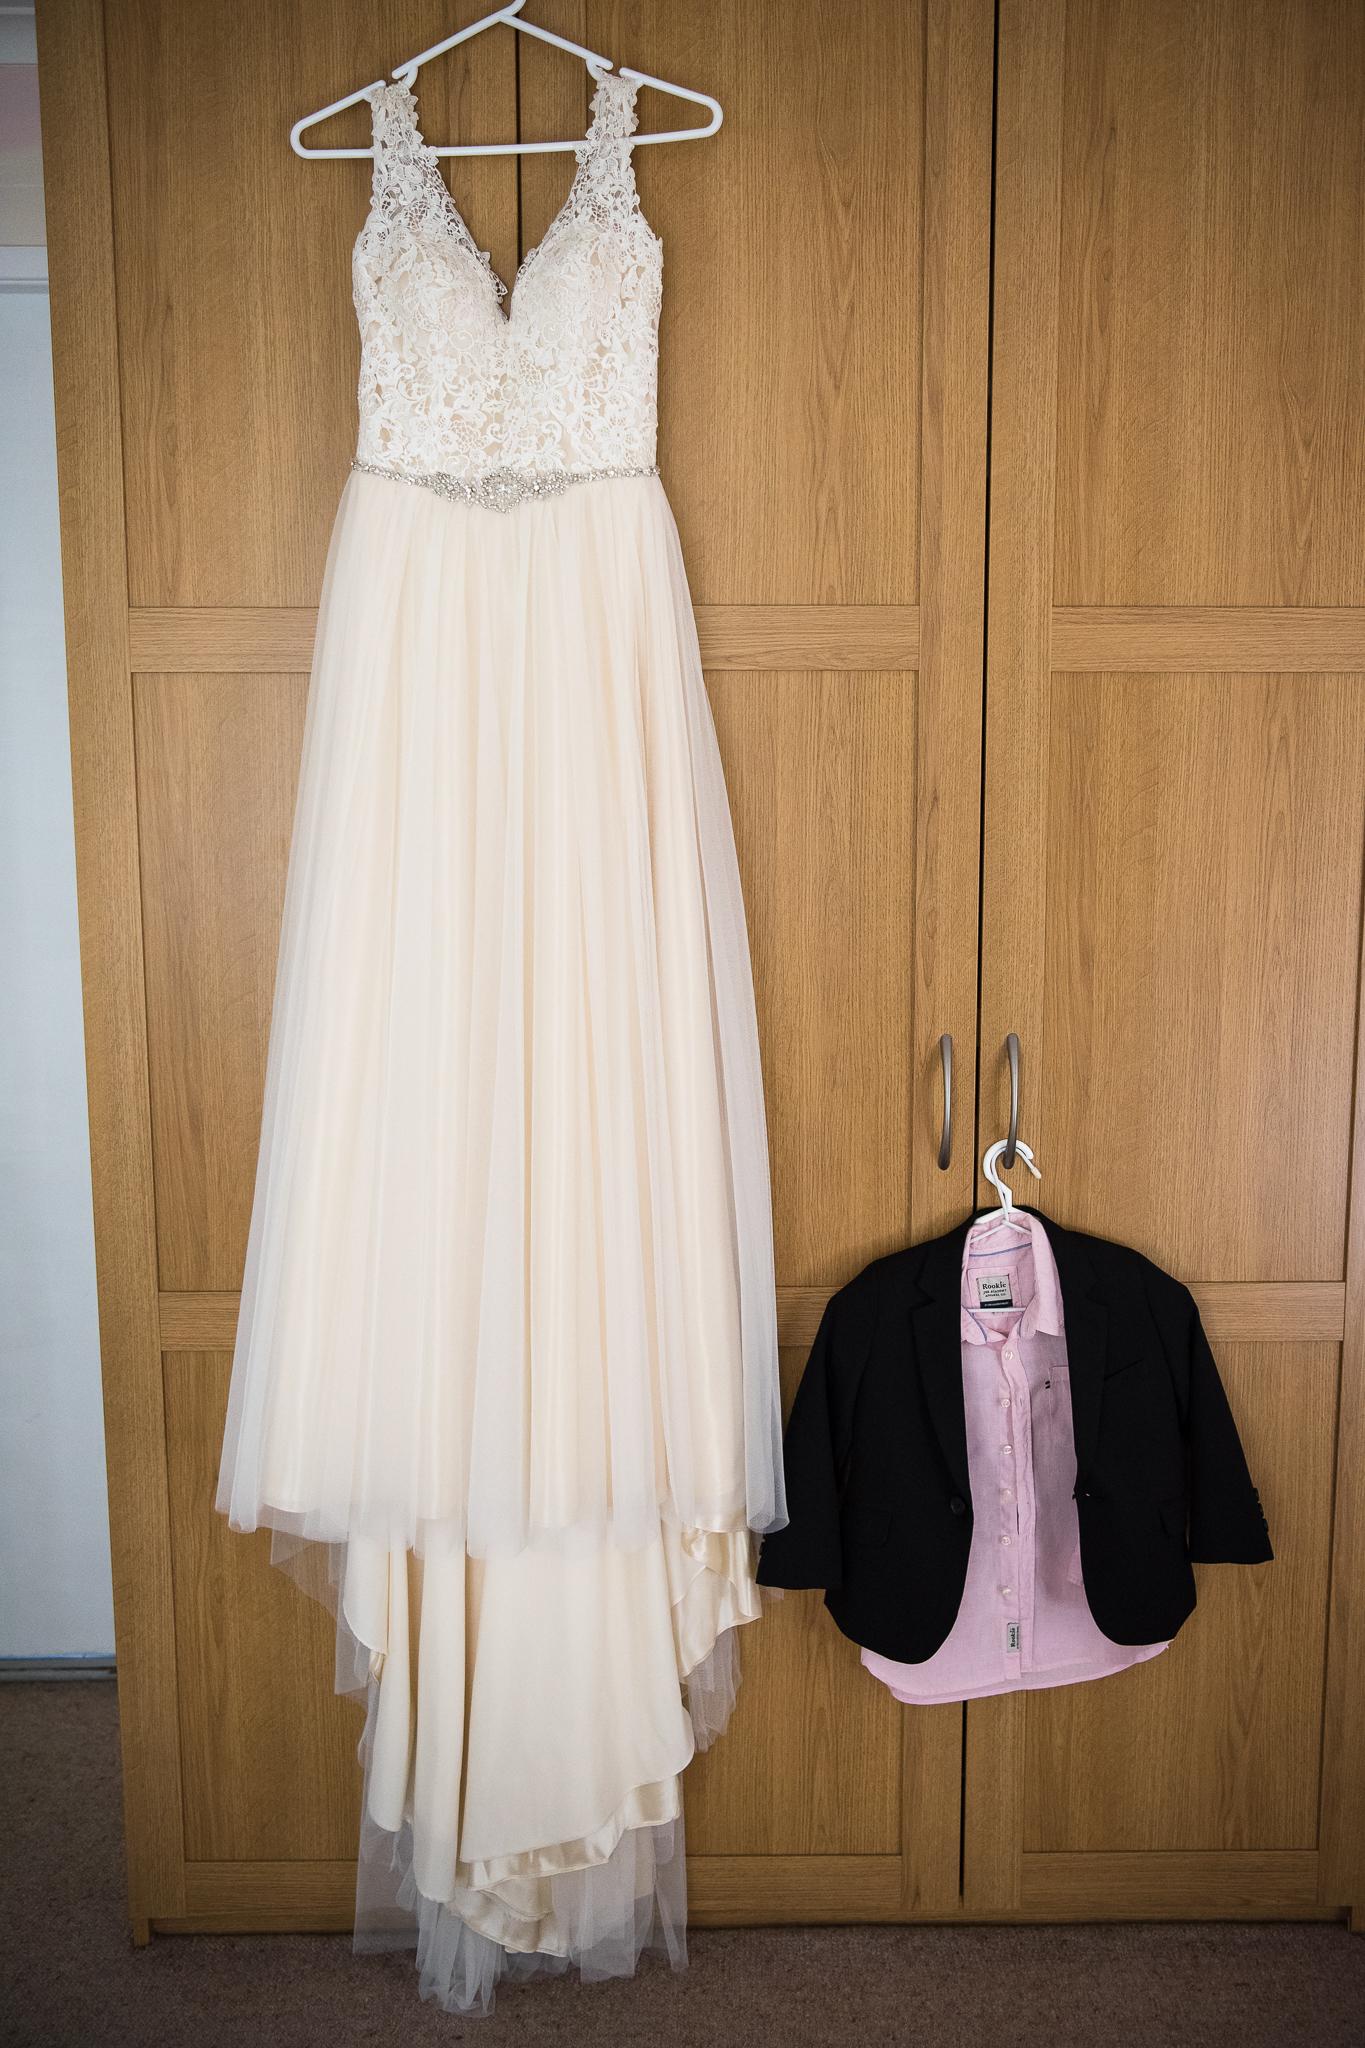 sydney wedding prep dress and tux